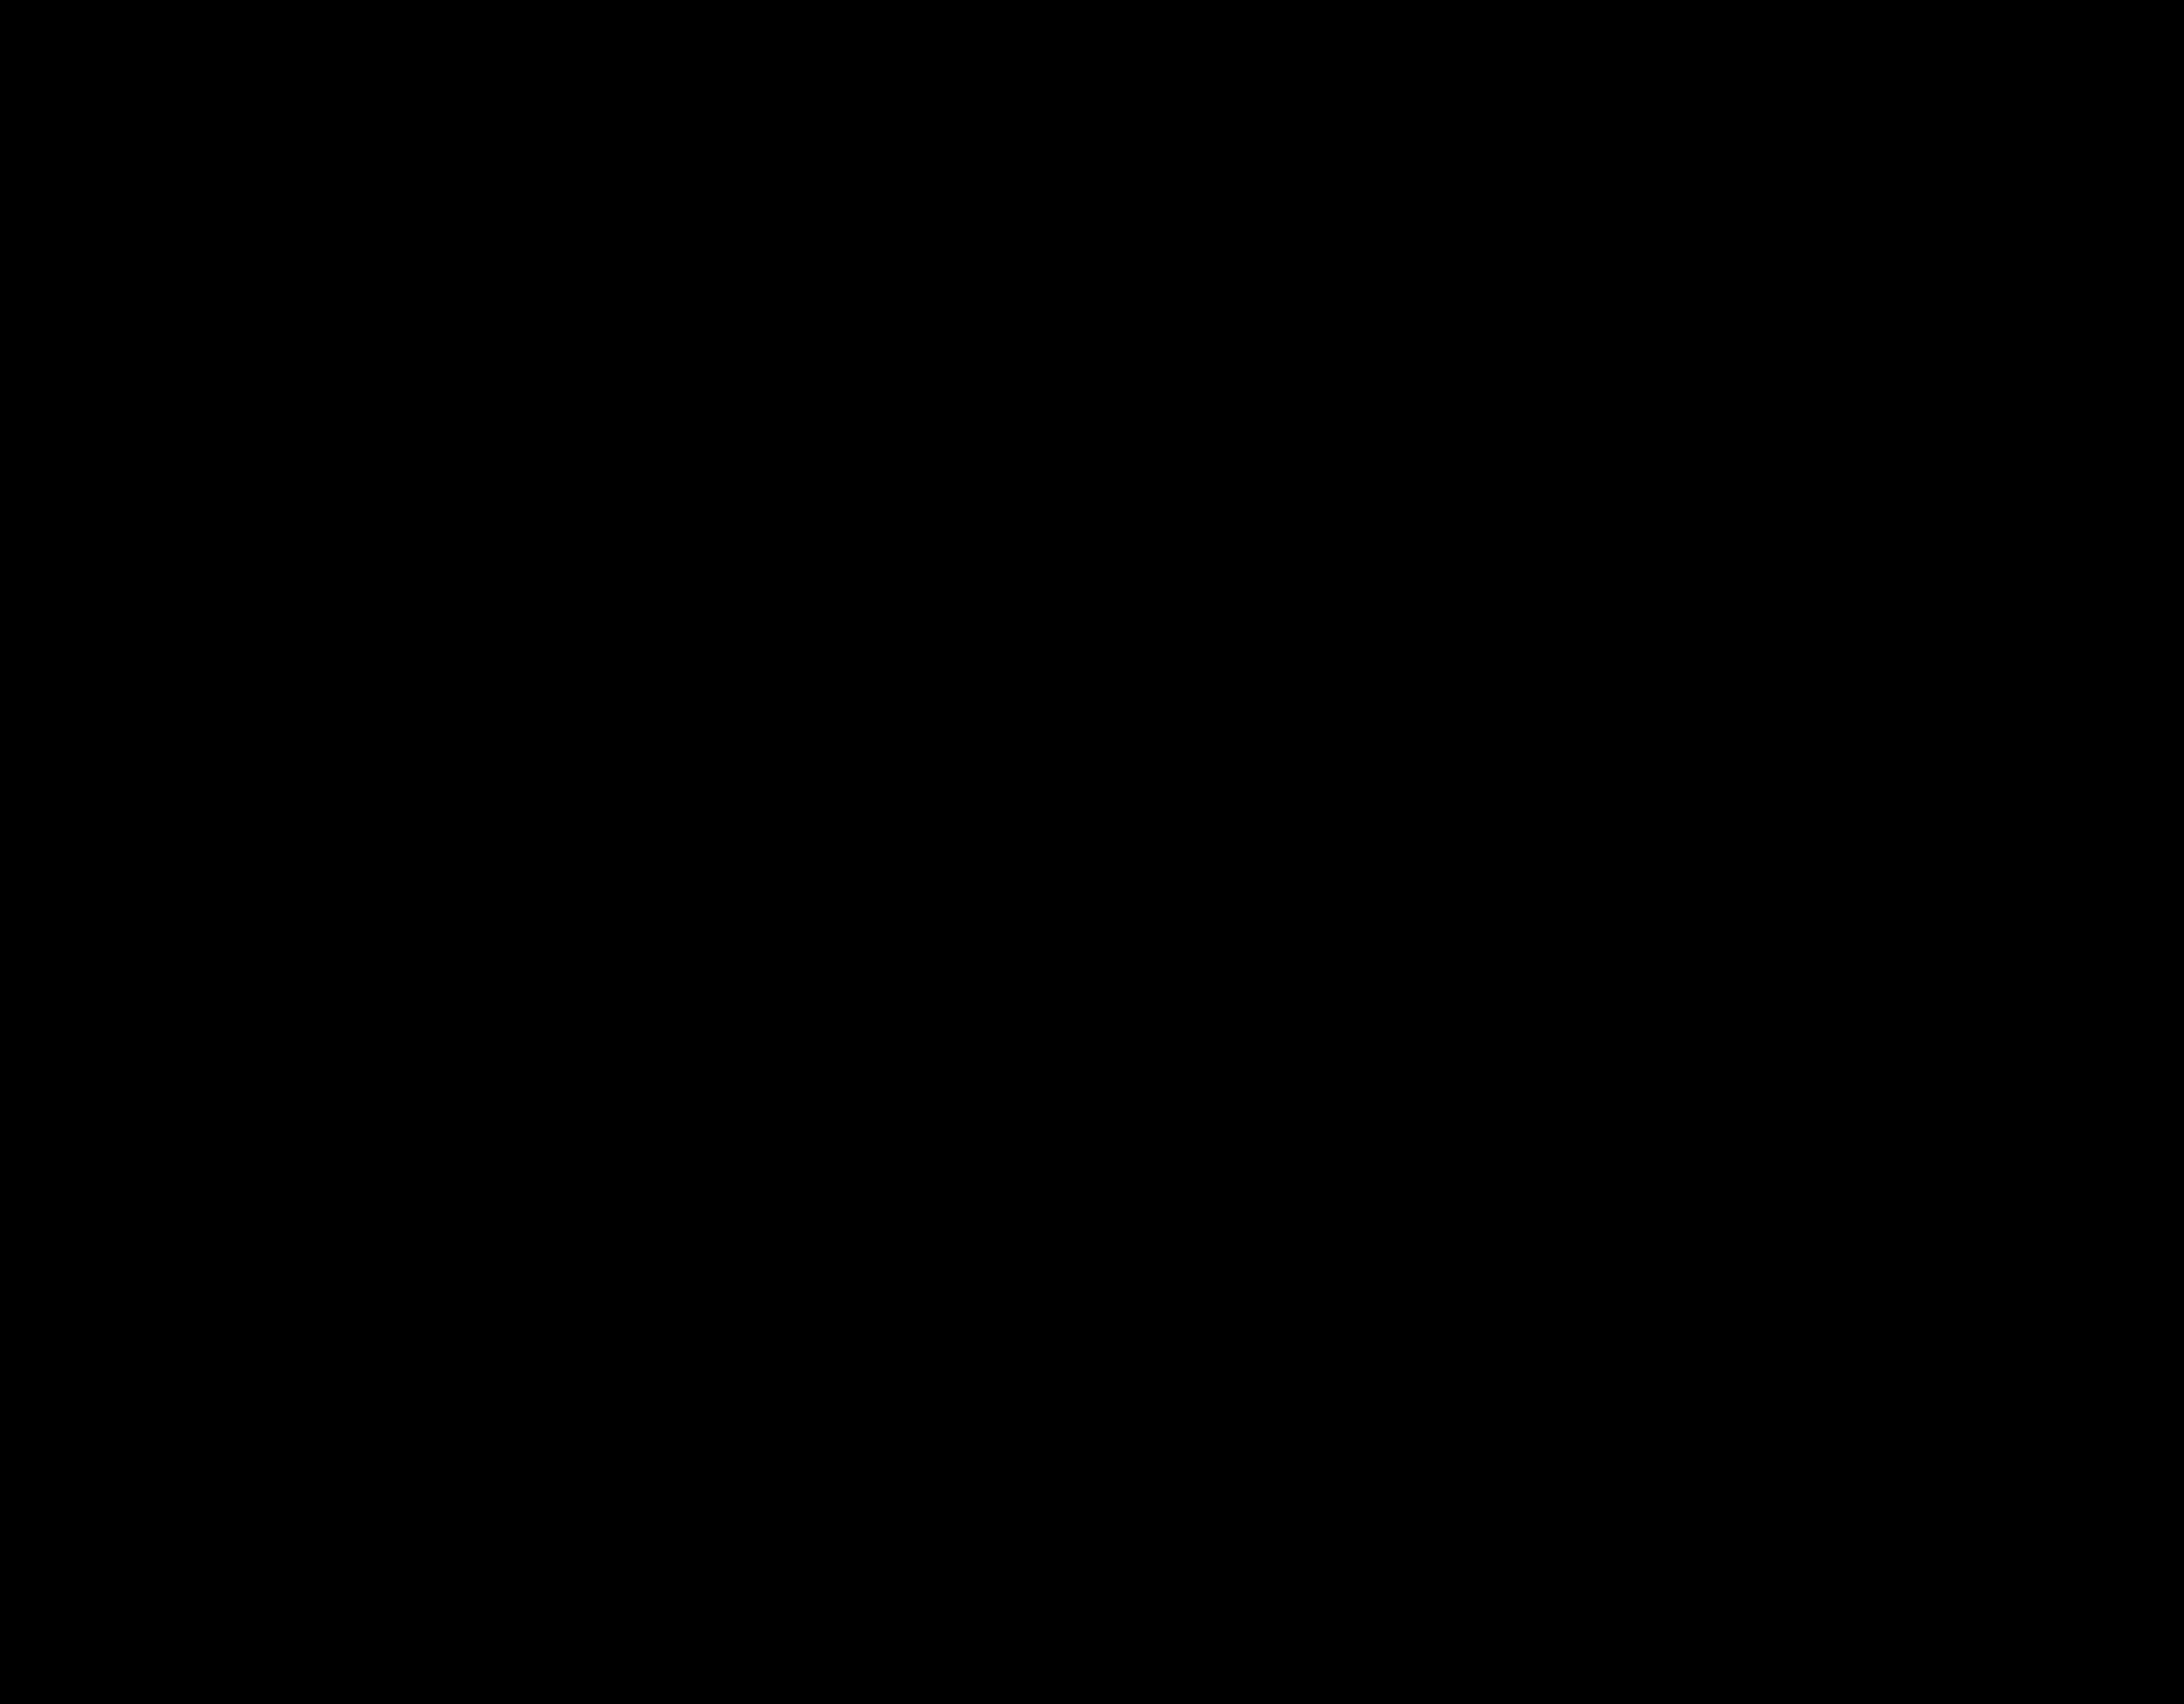 Dice Clipart Sketch Dice Sketch Transparent Free For Download On Webstockreview 2020